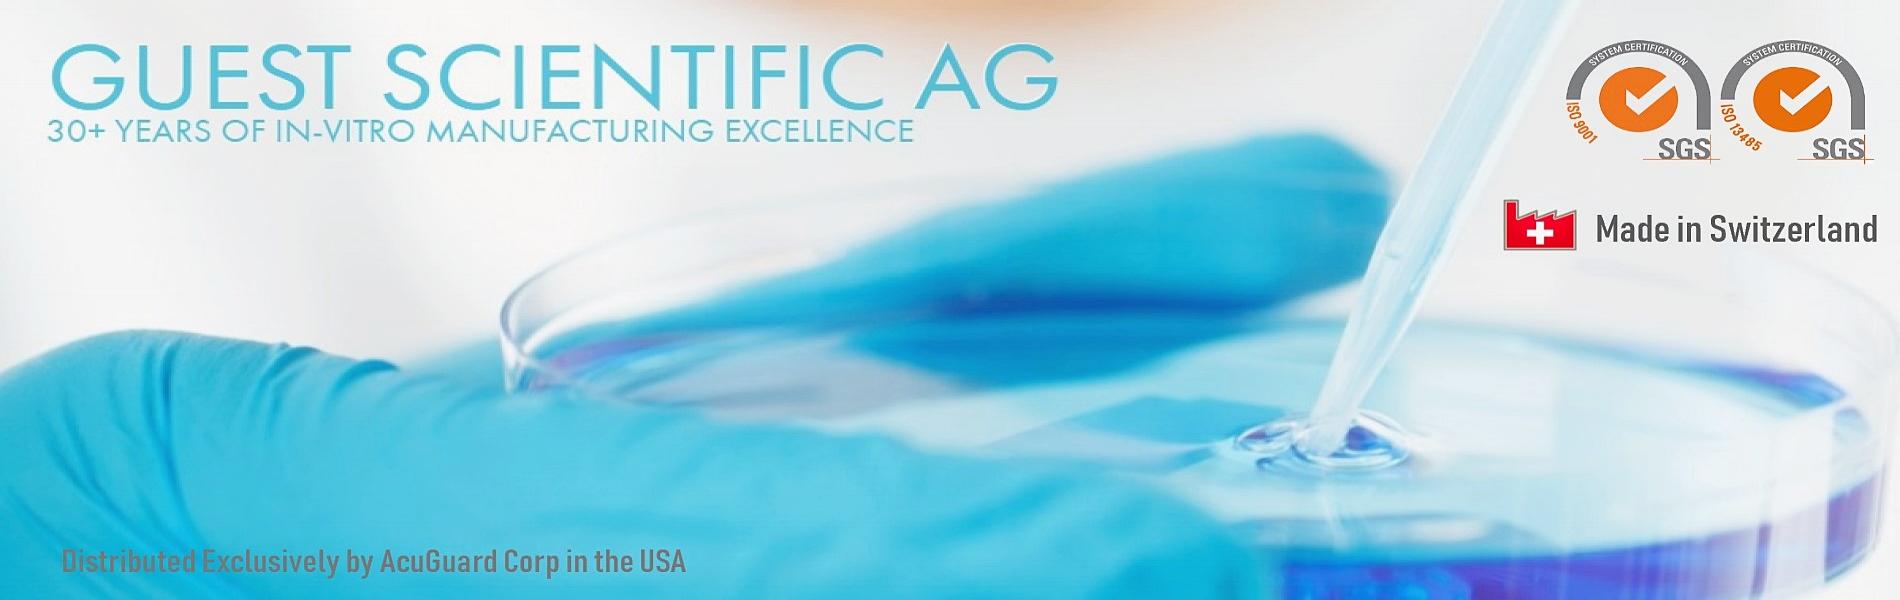 Guest Scientific AG